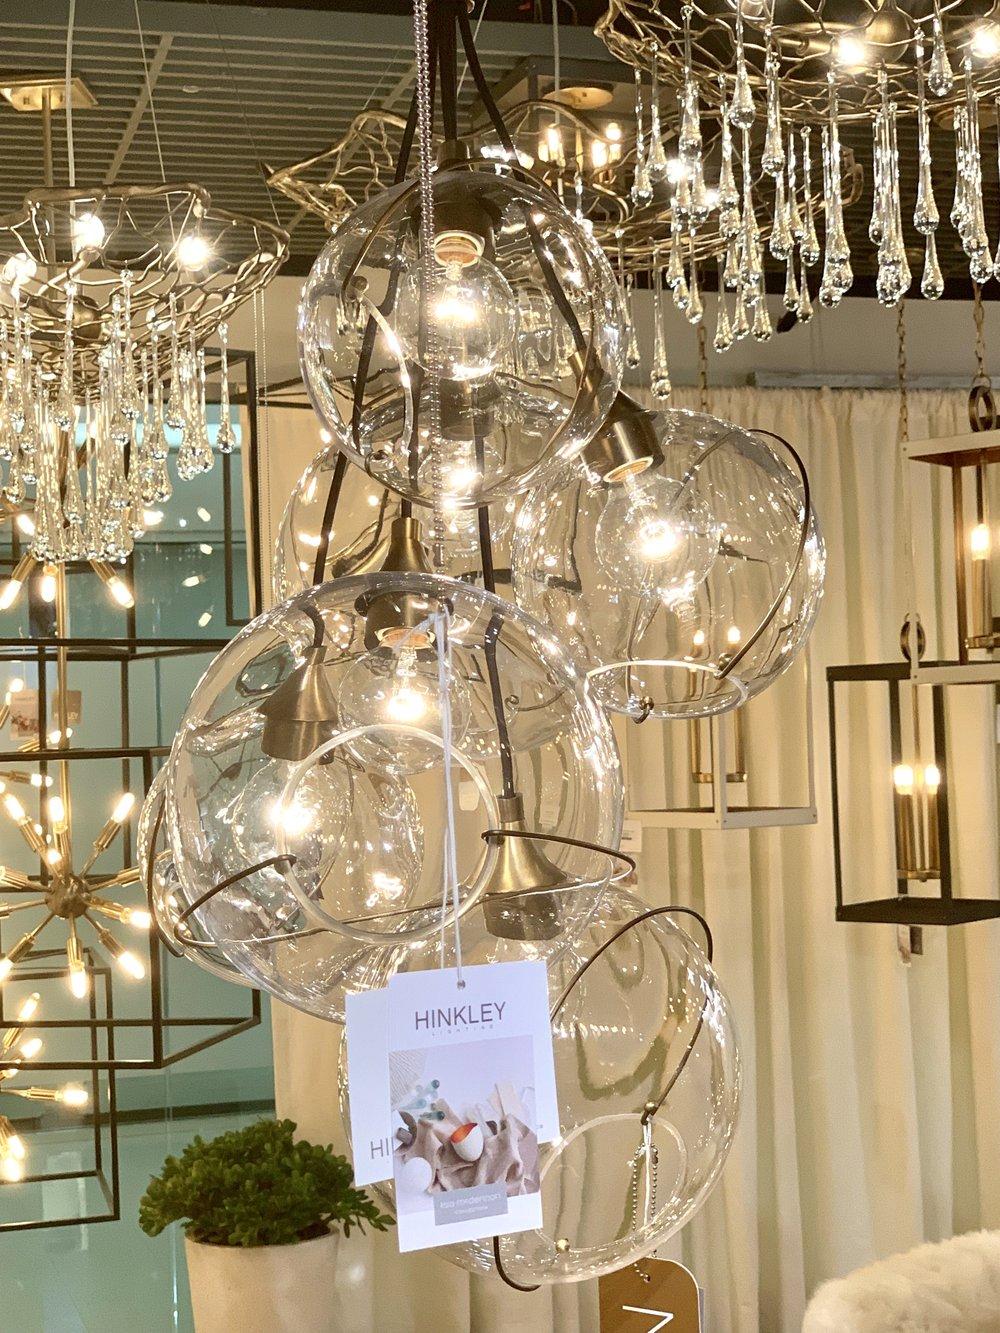 New lighting fixture by interior designer Lisa McDennon for Hinkley Lighting, debuting at January 2019 Lightovation during Dallas Market , image by Leslie Carothers .jpg